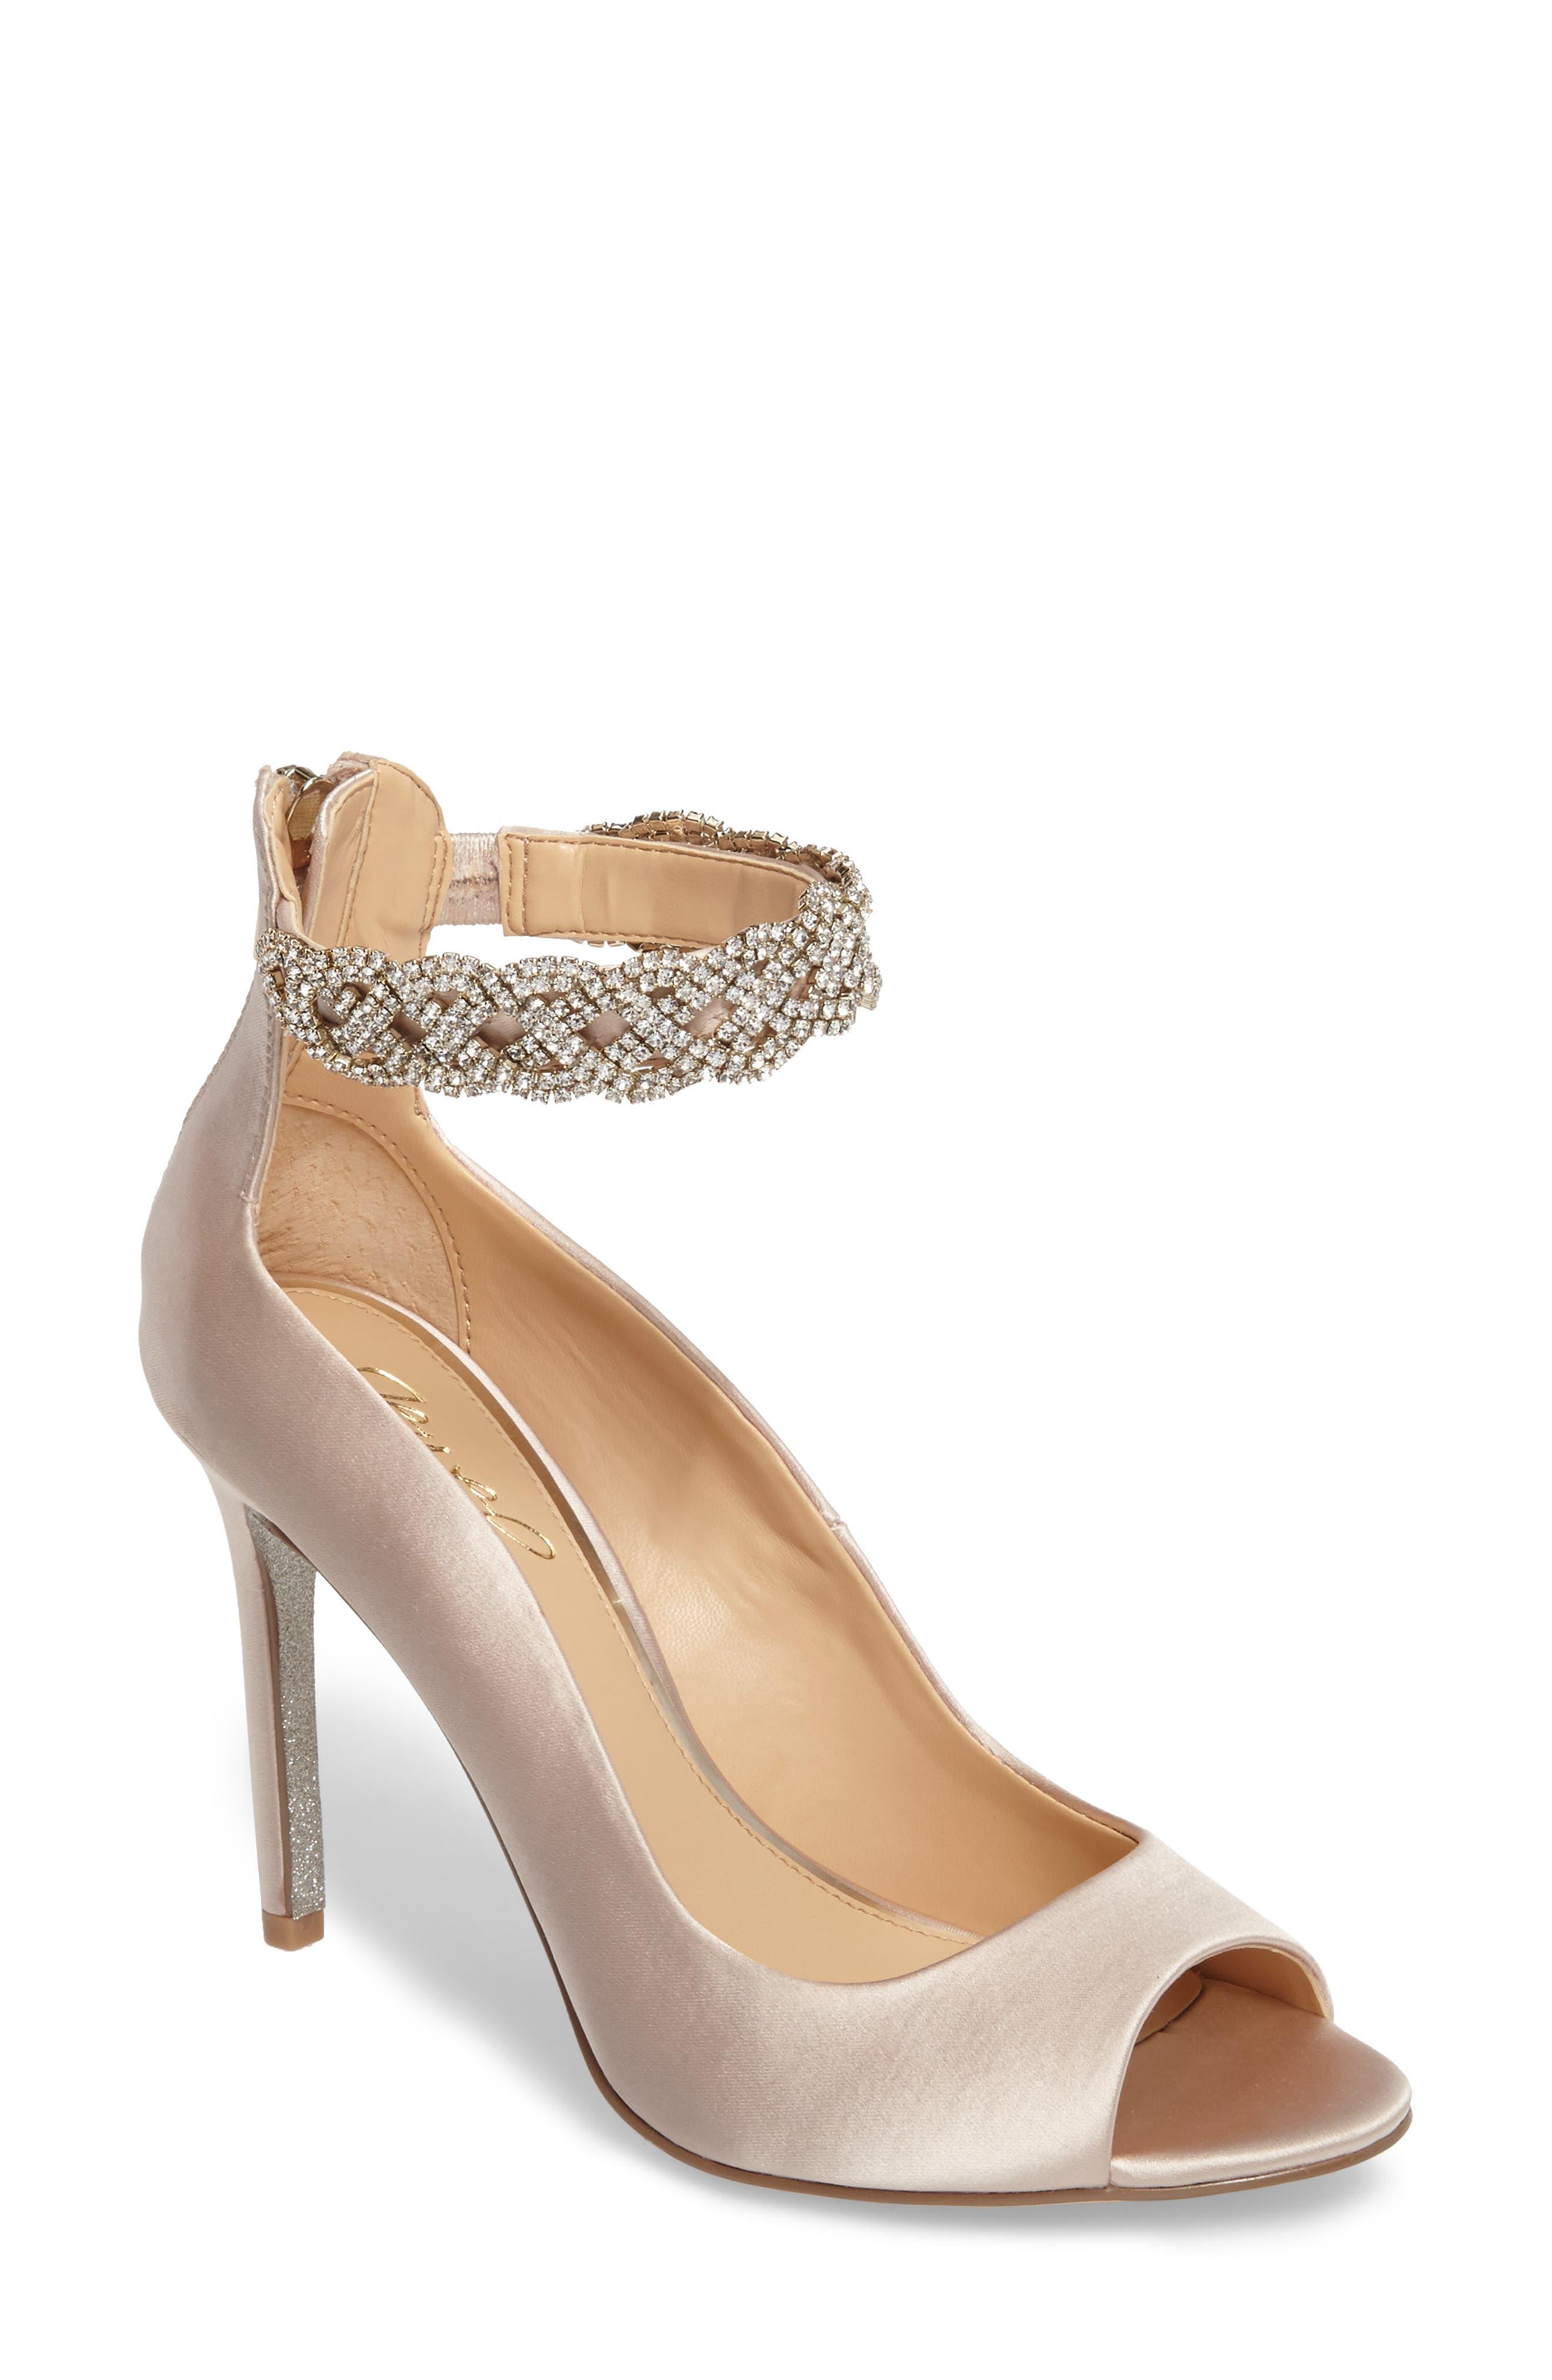 Alanis Embellished Ankle Strap Pump,                         Main,                         color, Champagne Satin